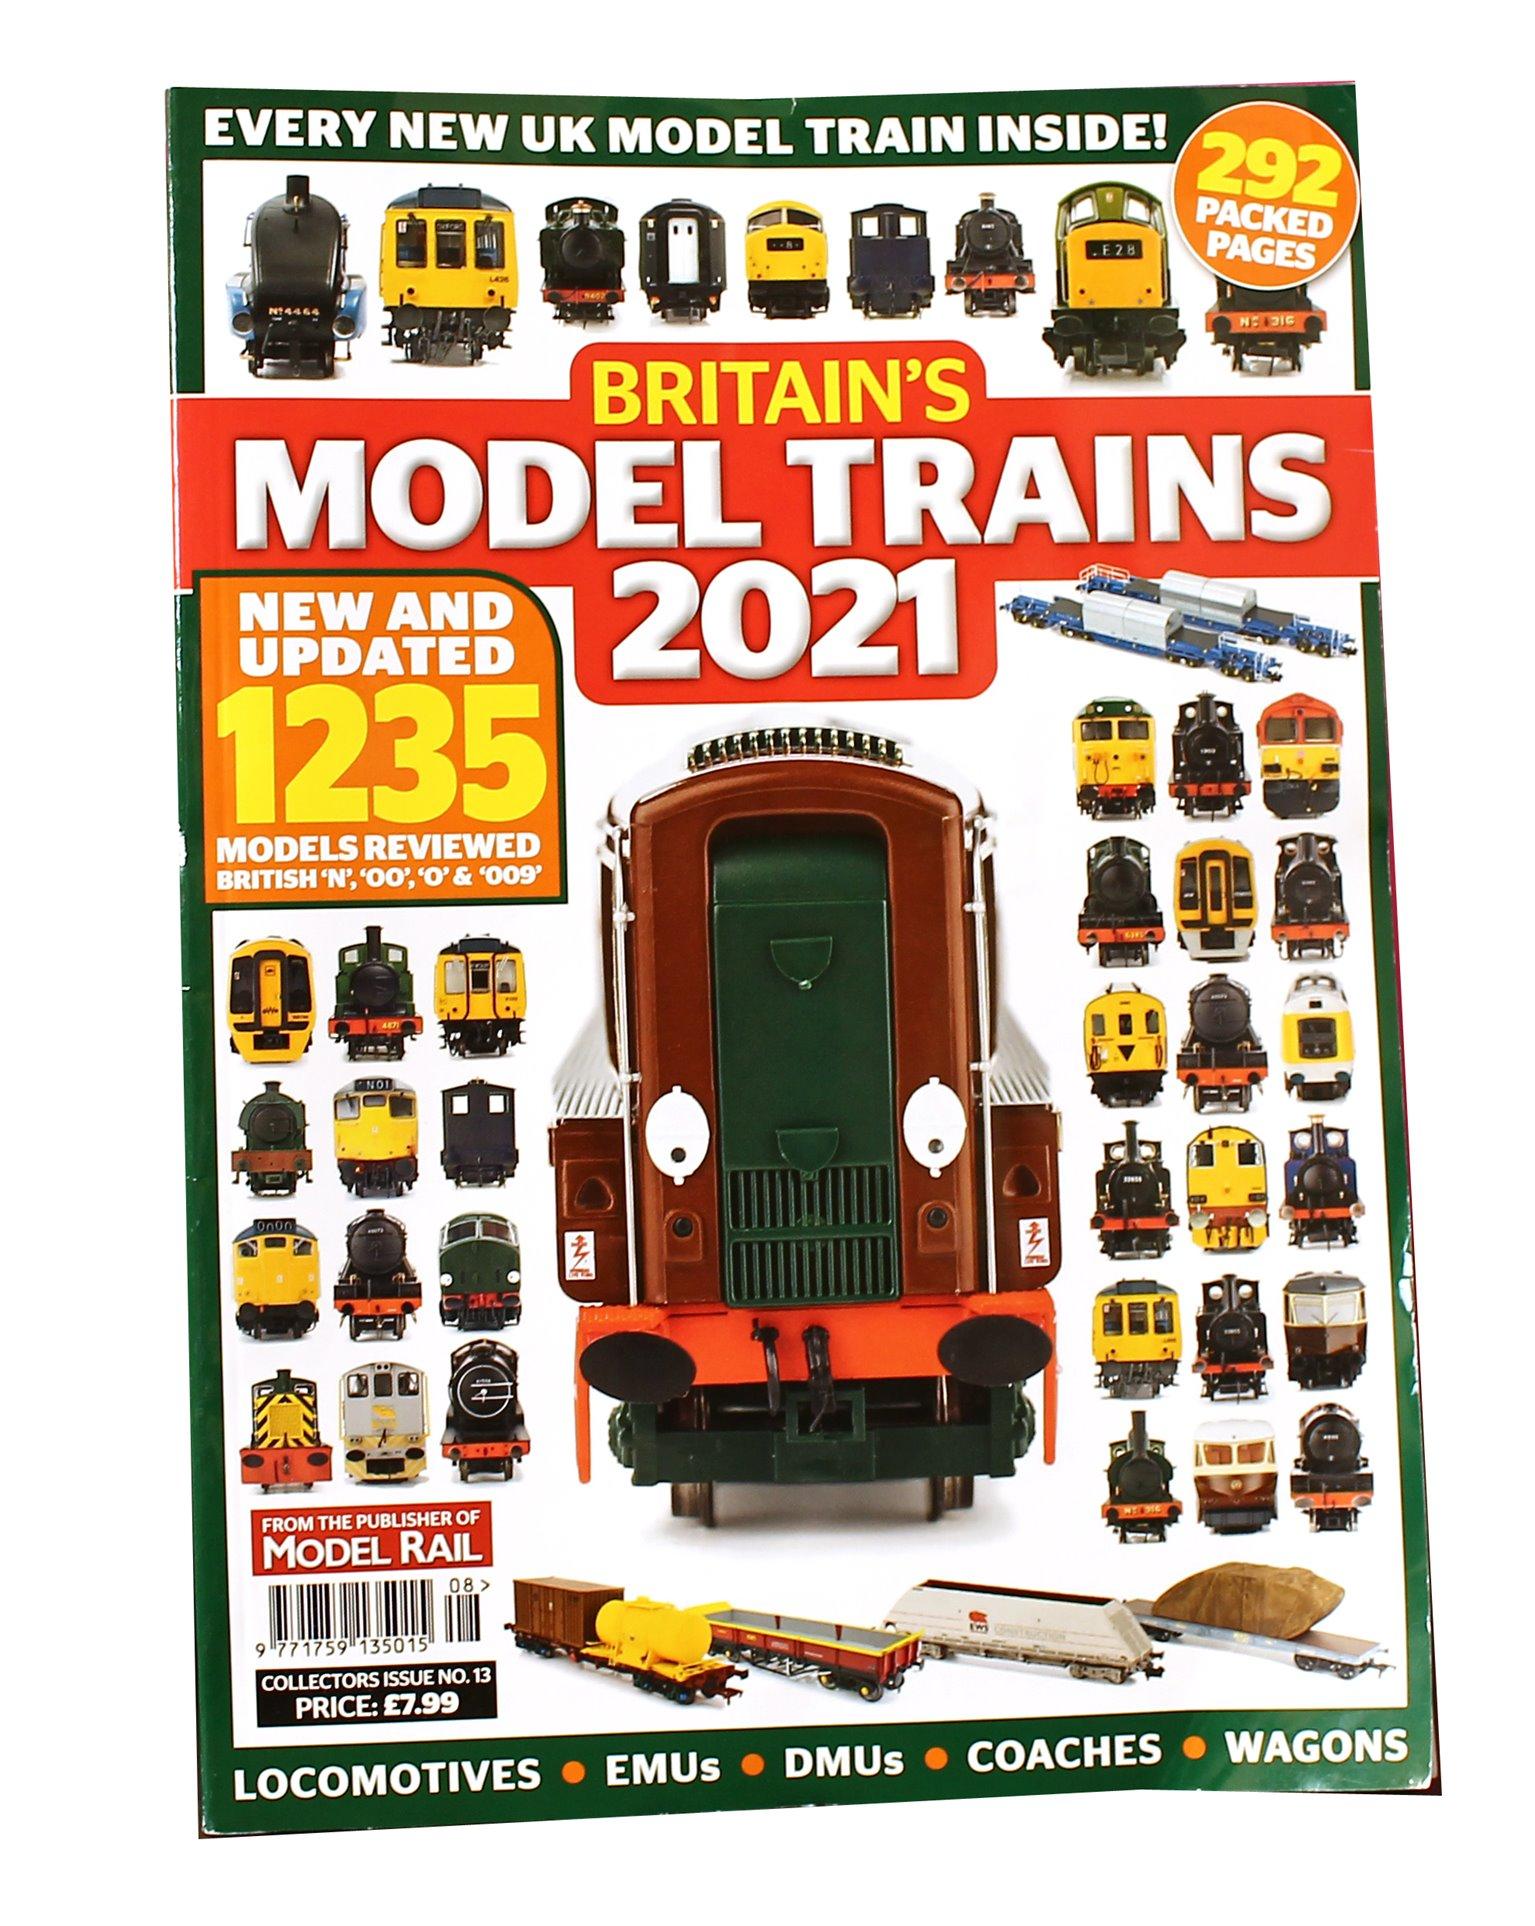 Britain's Model Trains 2021